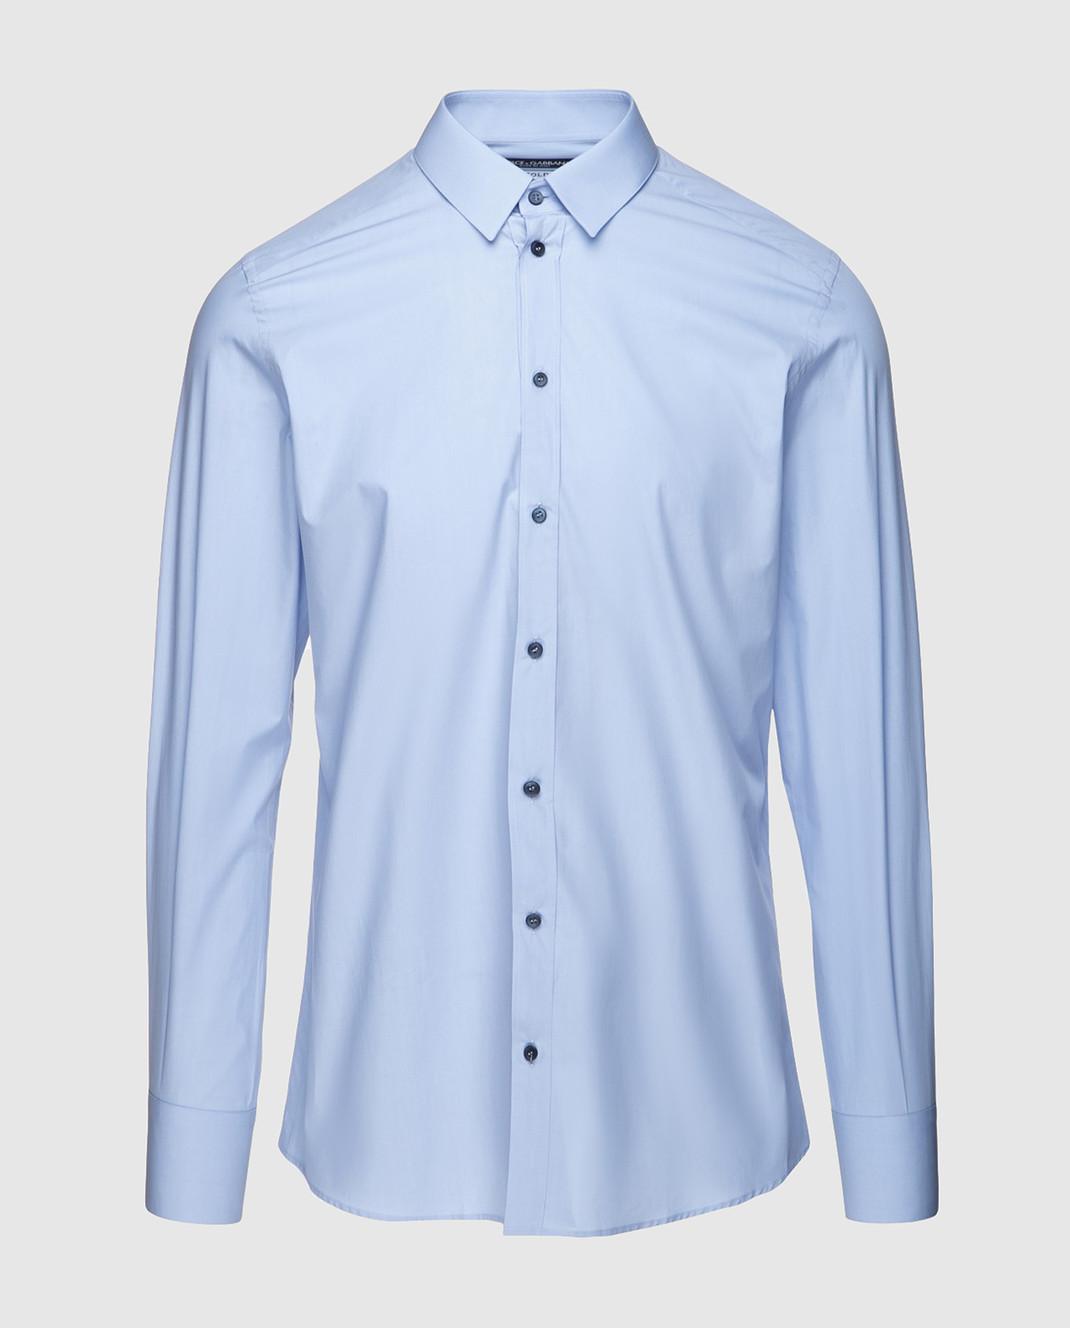 Dolce&Gabbana Голубая рубашка G5EJ0TFU5GK